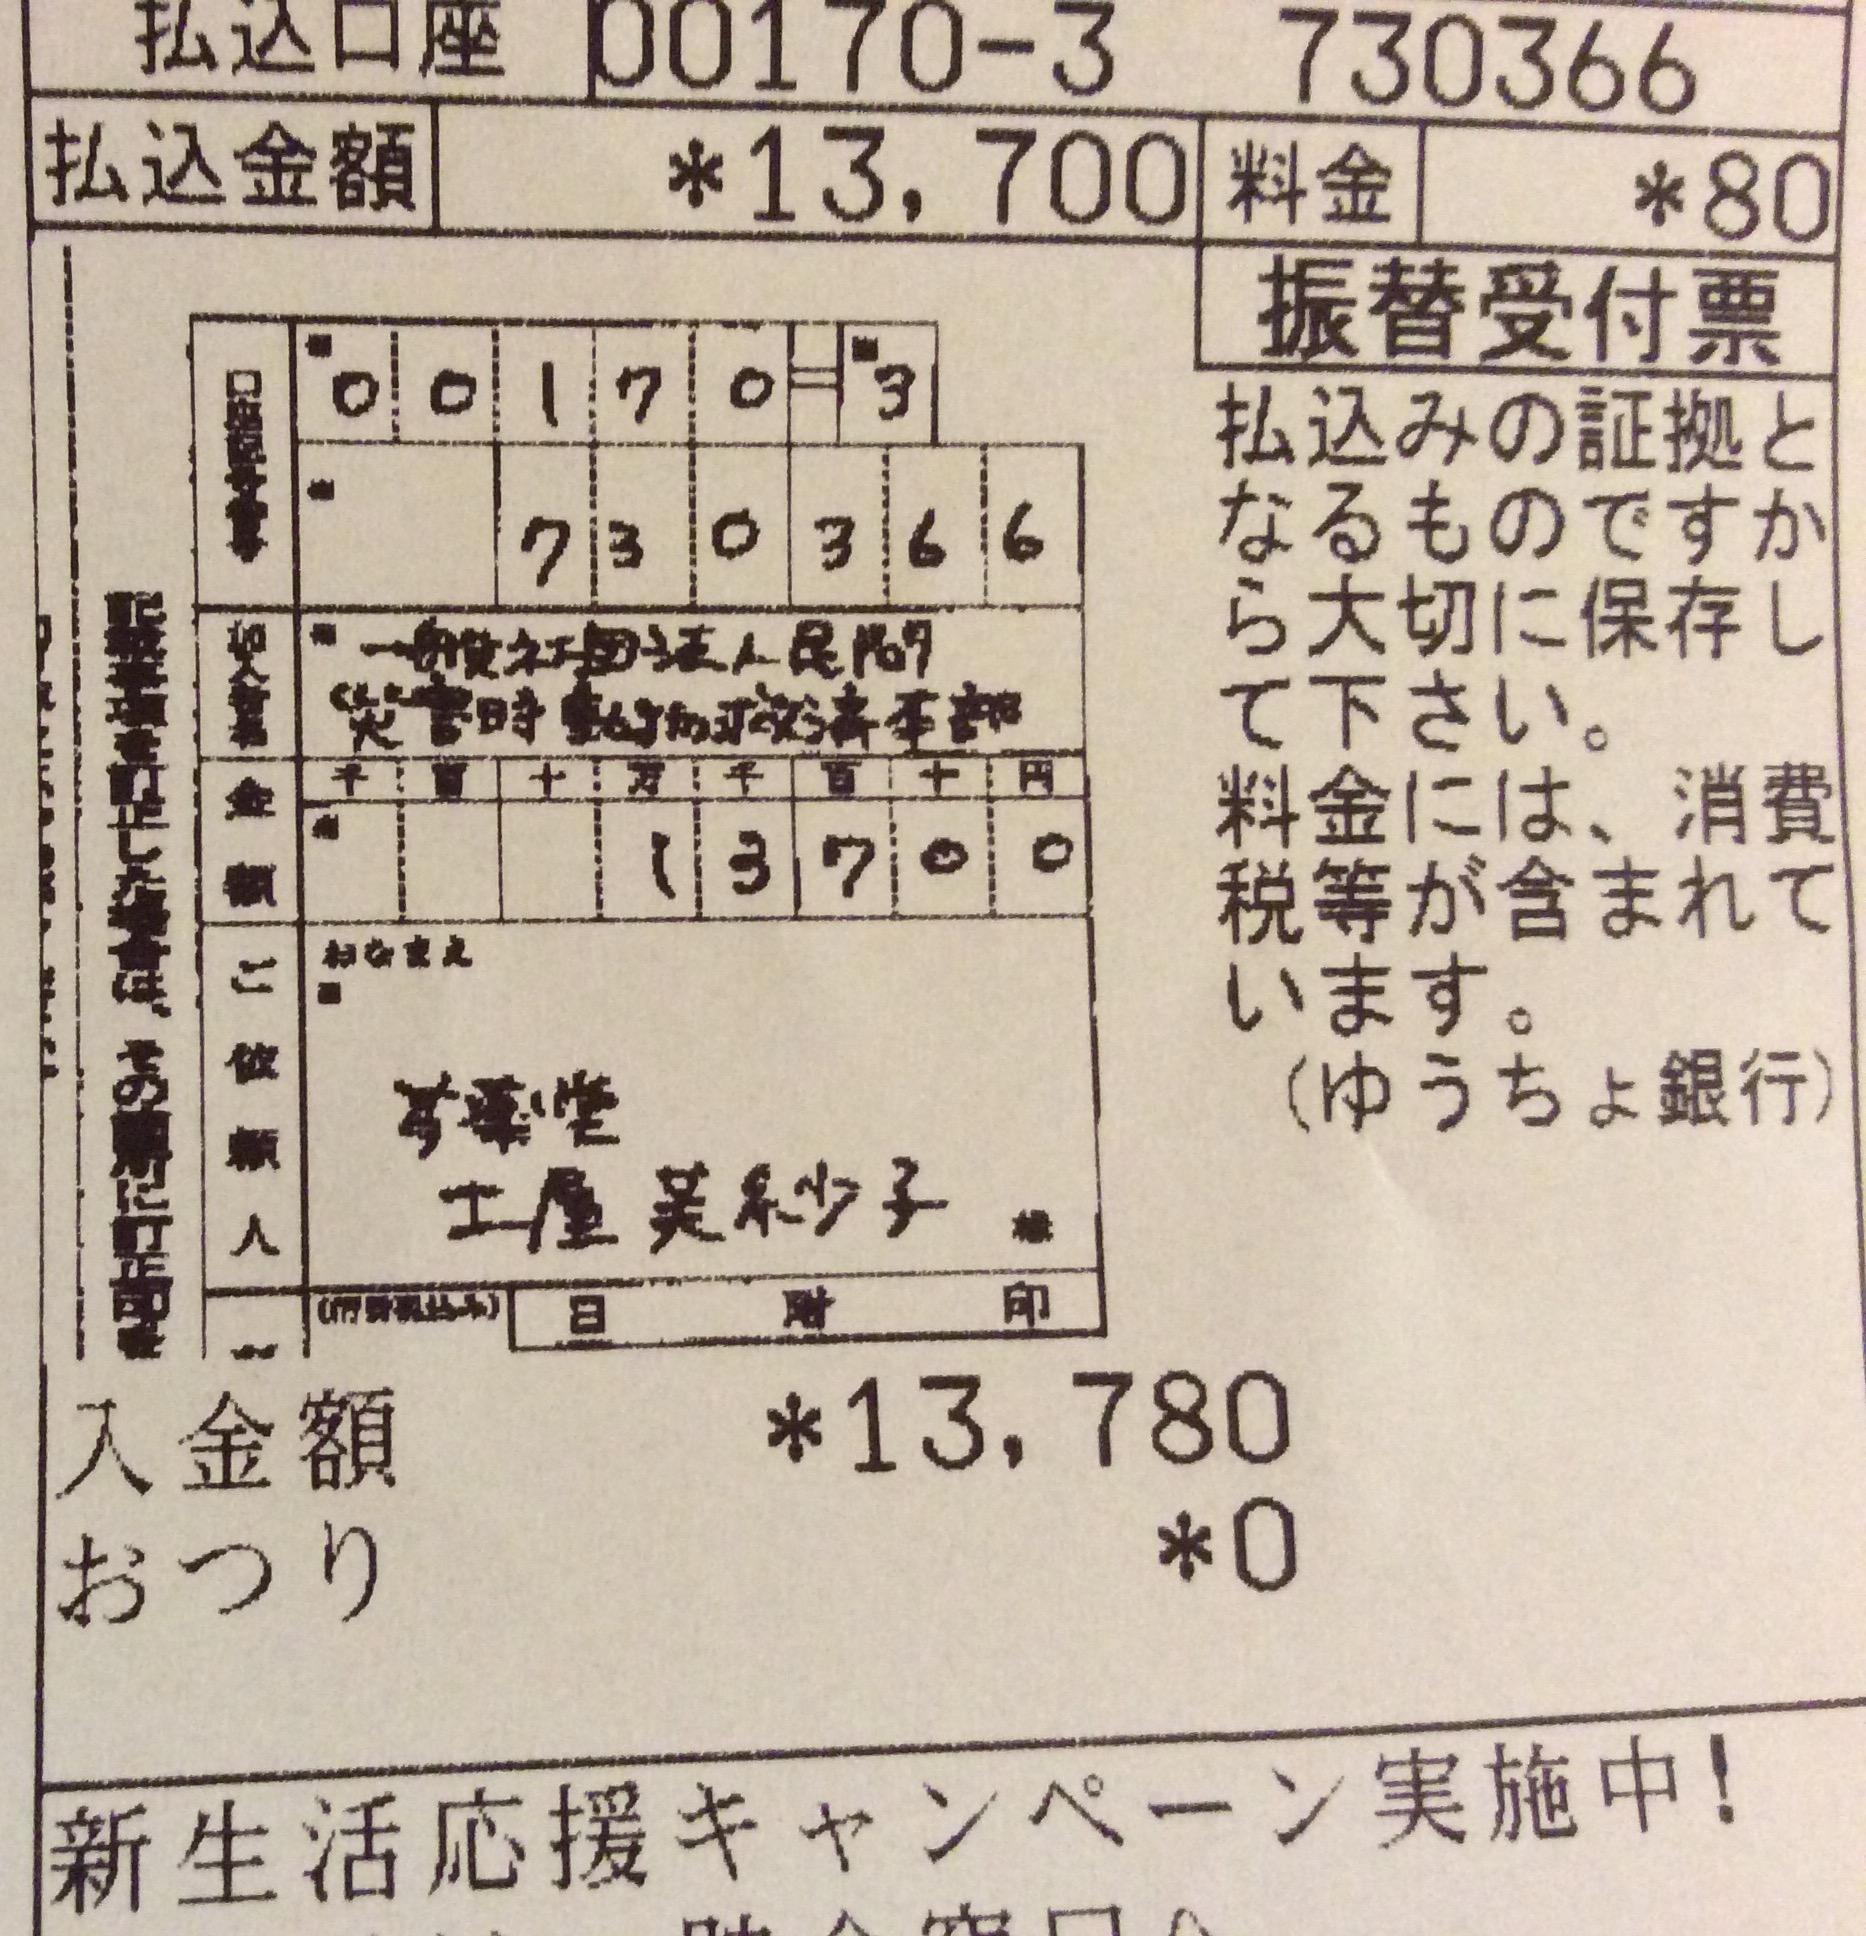 20160519164028cd9.jpeg